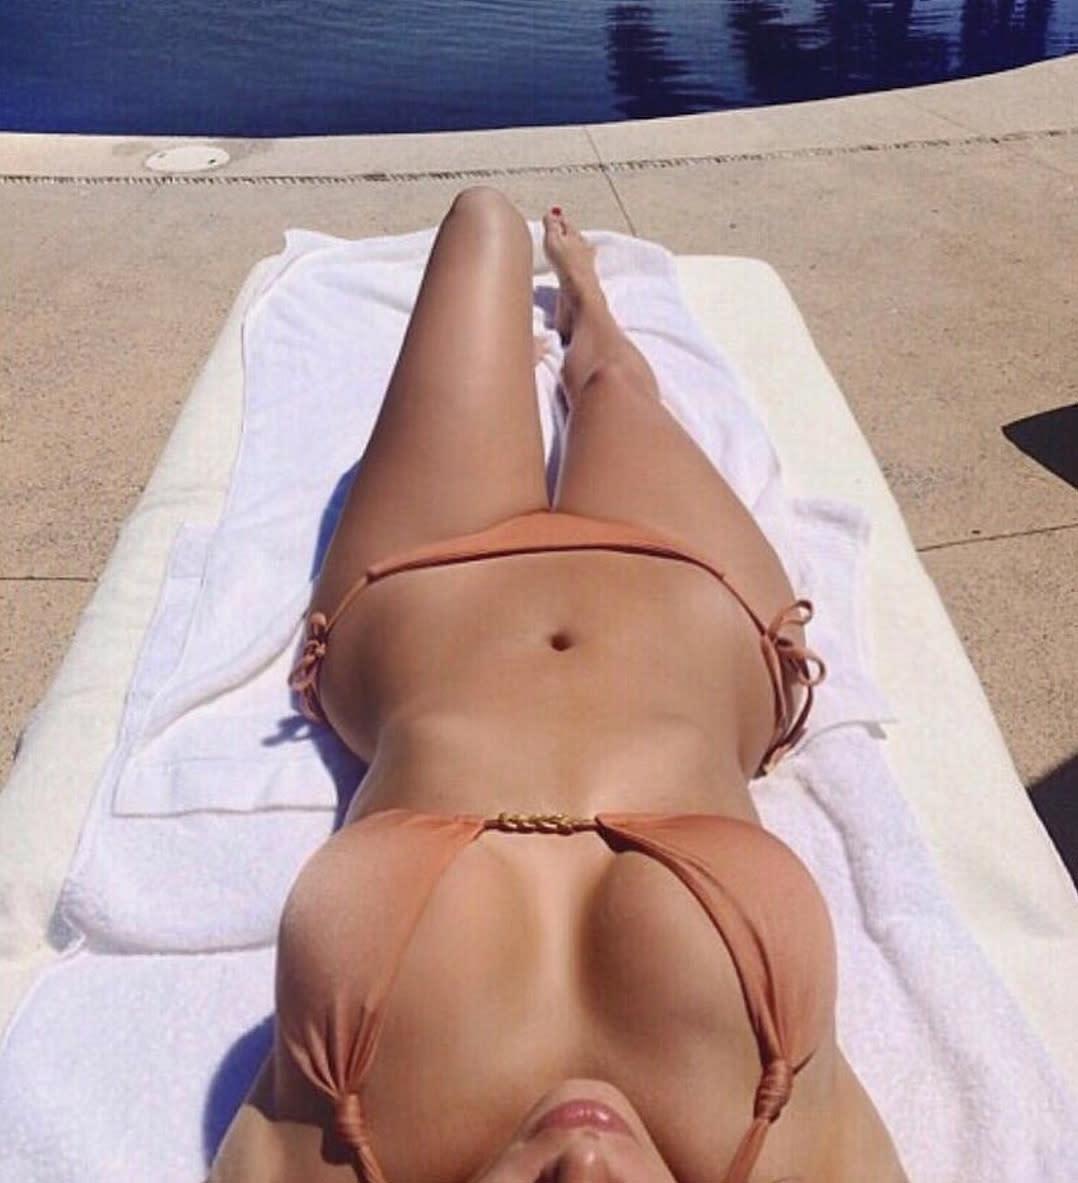 Kim Kardashian Selfish Kim Kardashian West on Amazoncom FREE shipping on qualifying offers New York Times Bestseller Celebrity List The selfie photography